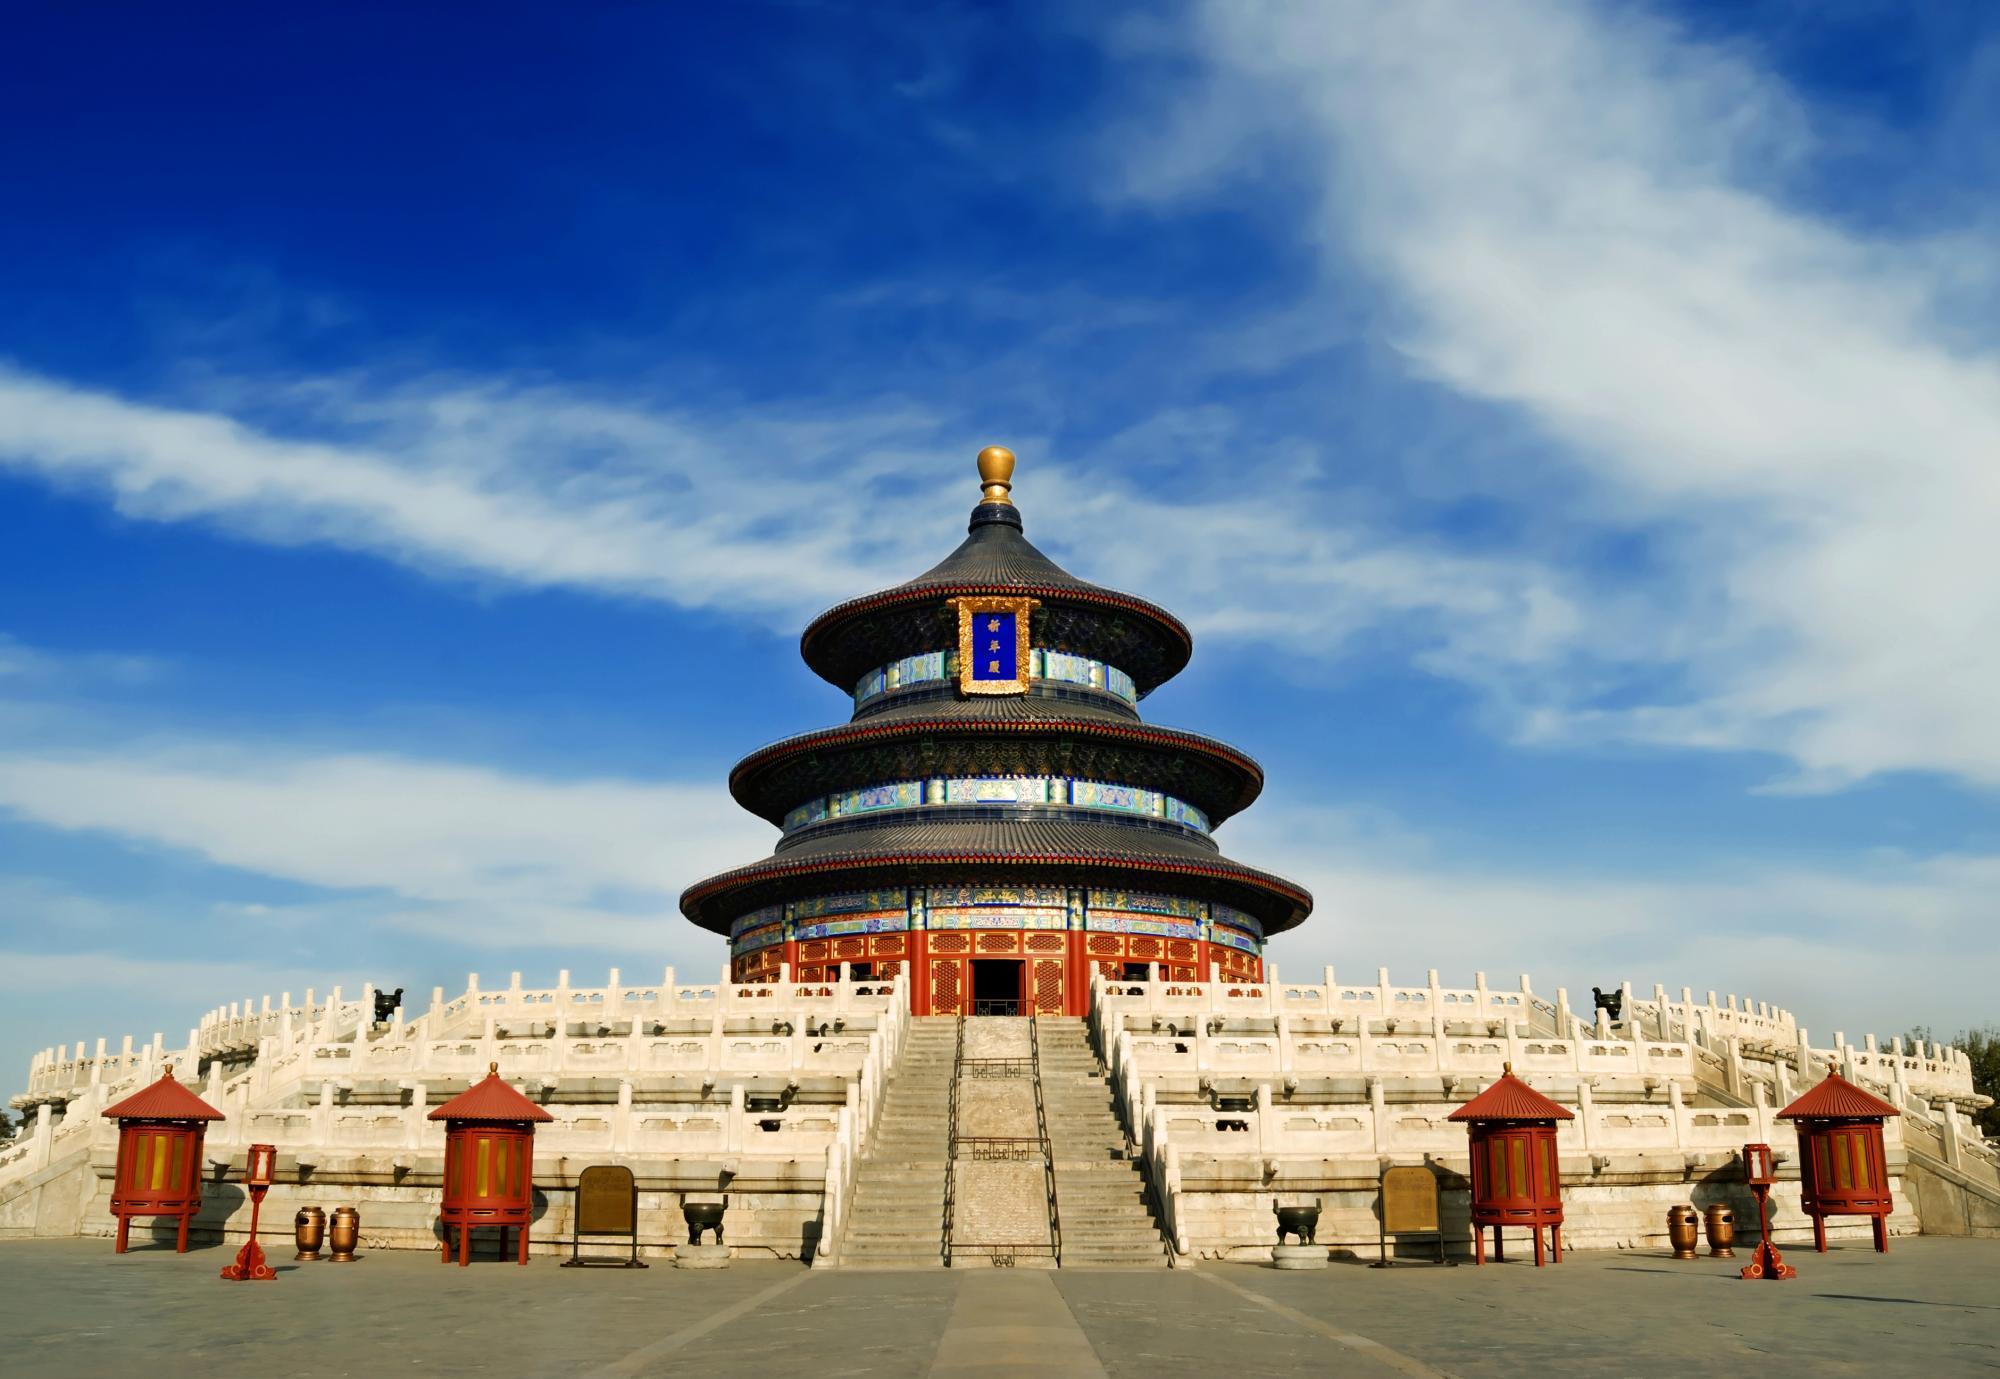 China_Beijing_tour_Temple_of_Heaven2_-_Mongol_Destination_Travel